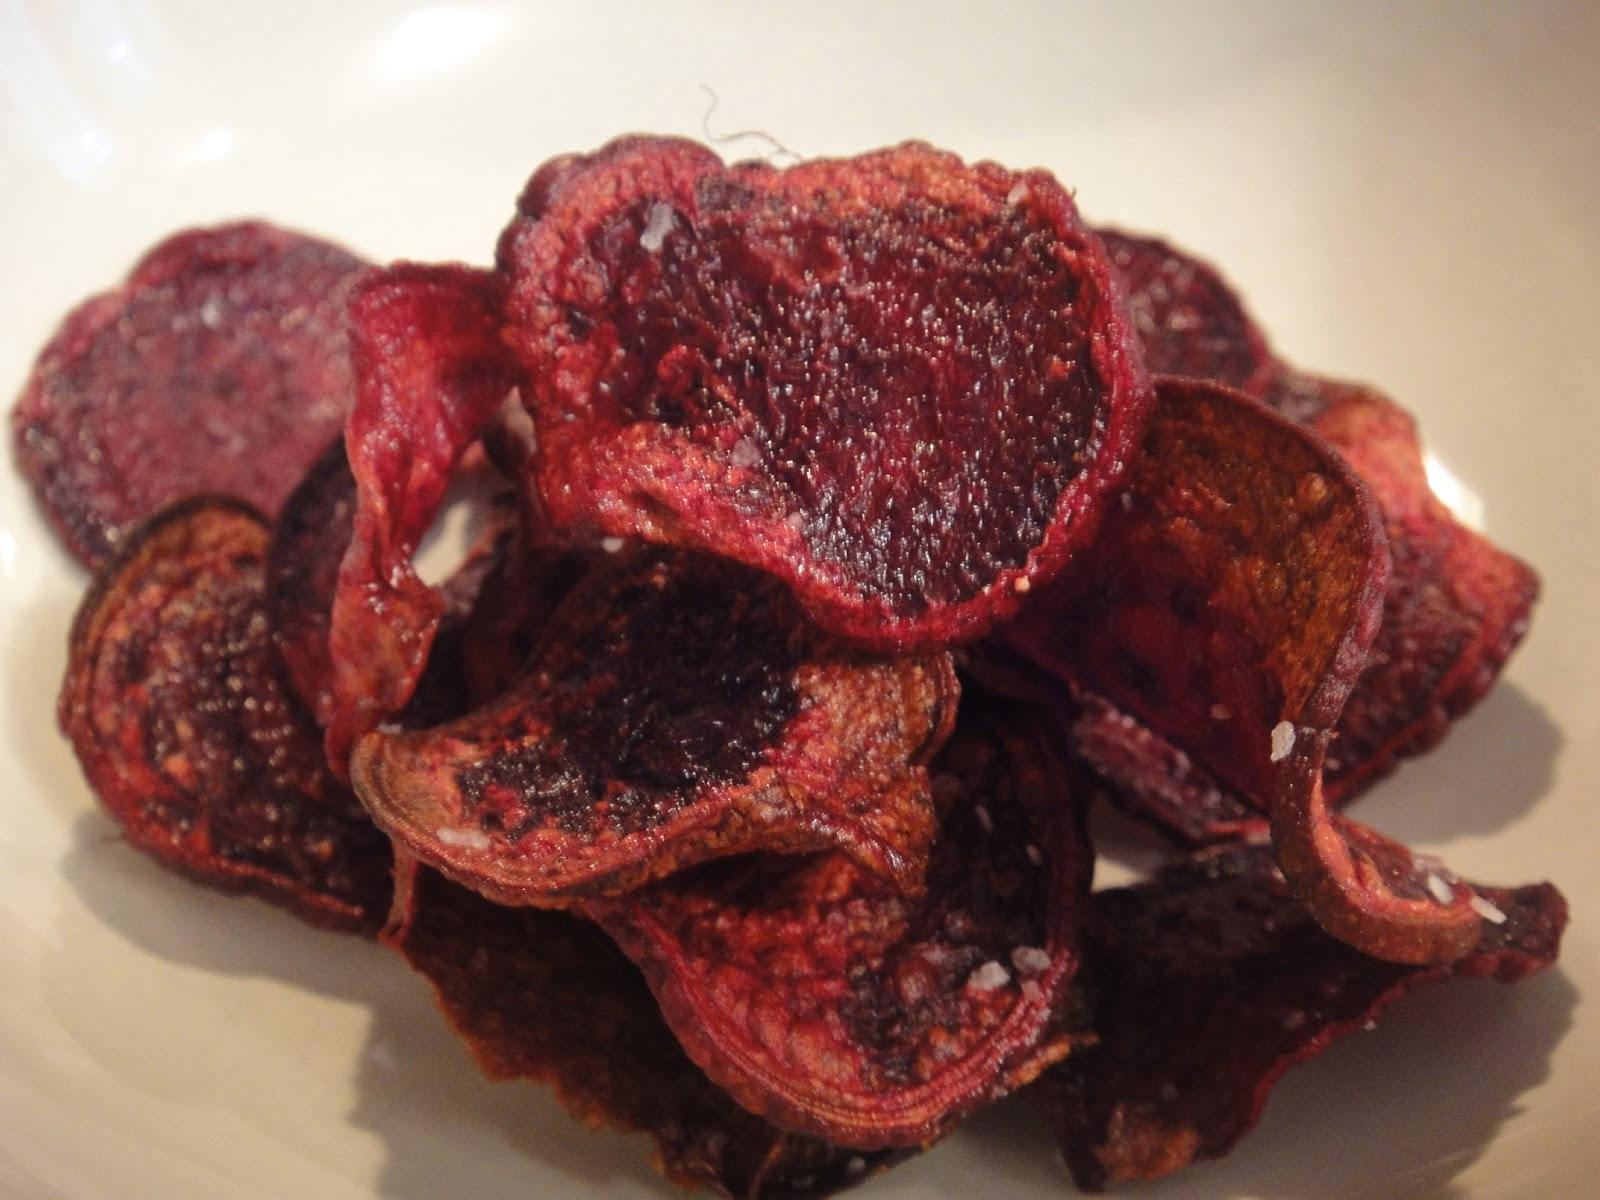 beet chips 2 ways ingredients 4 medium to large beets